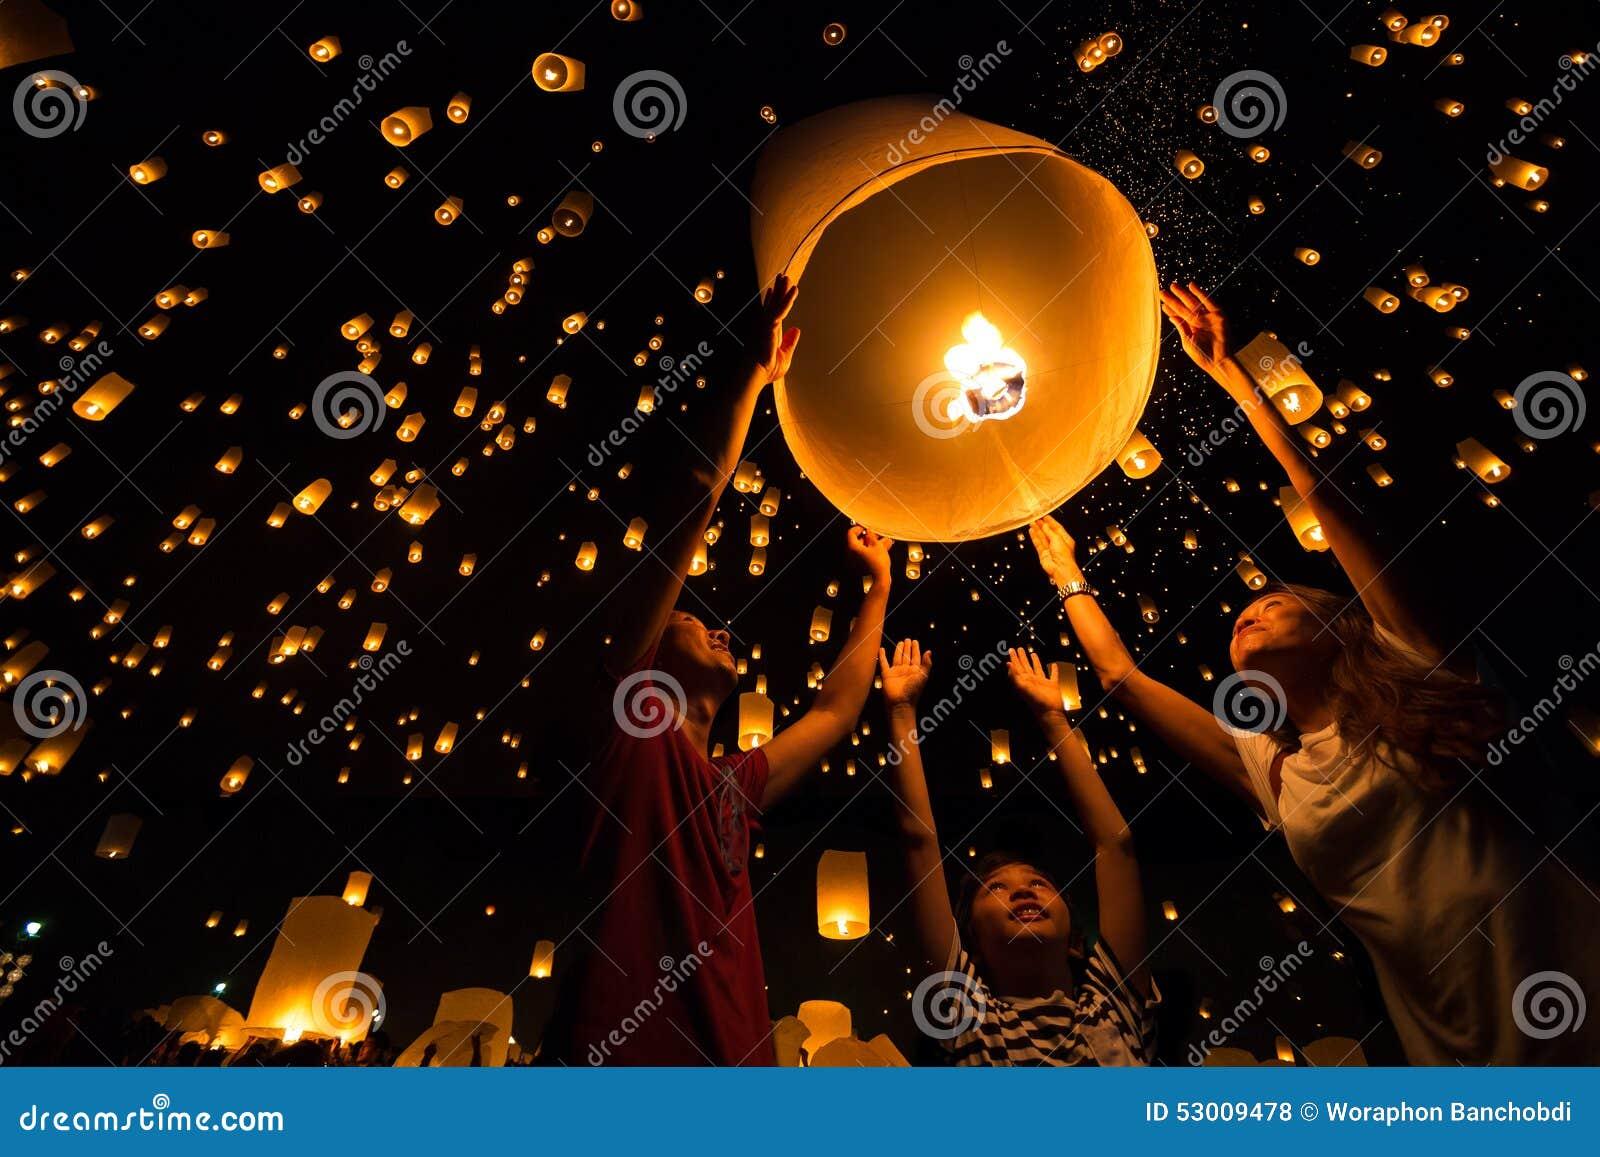 Download 灯笼 库存照片. 图片 包括有 灯笼, 纸张, 文化, 橙色, 浪漫, 演奏台, 庆祝, 蜡烛, 浮动, 旅行 - 53009478